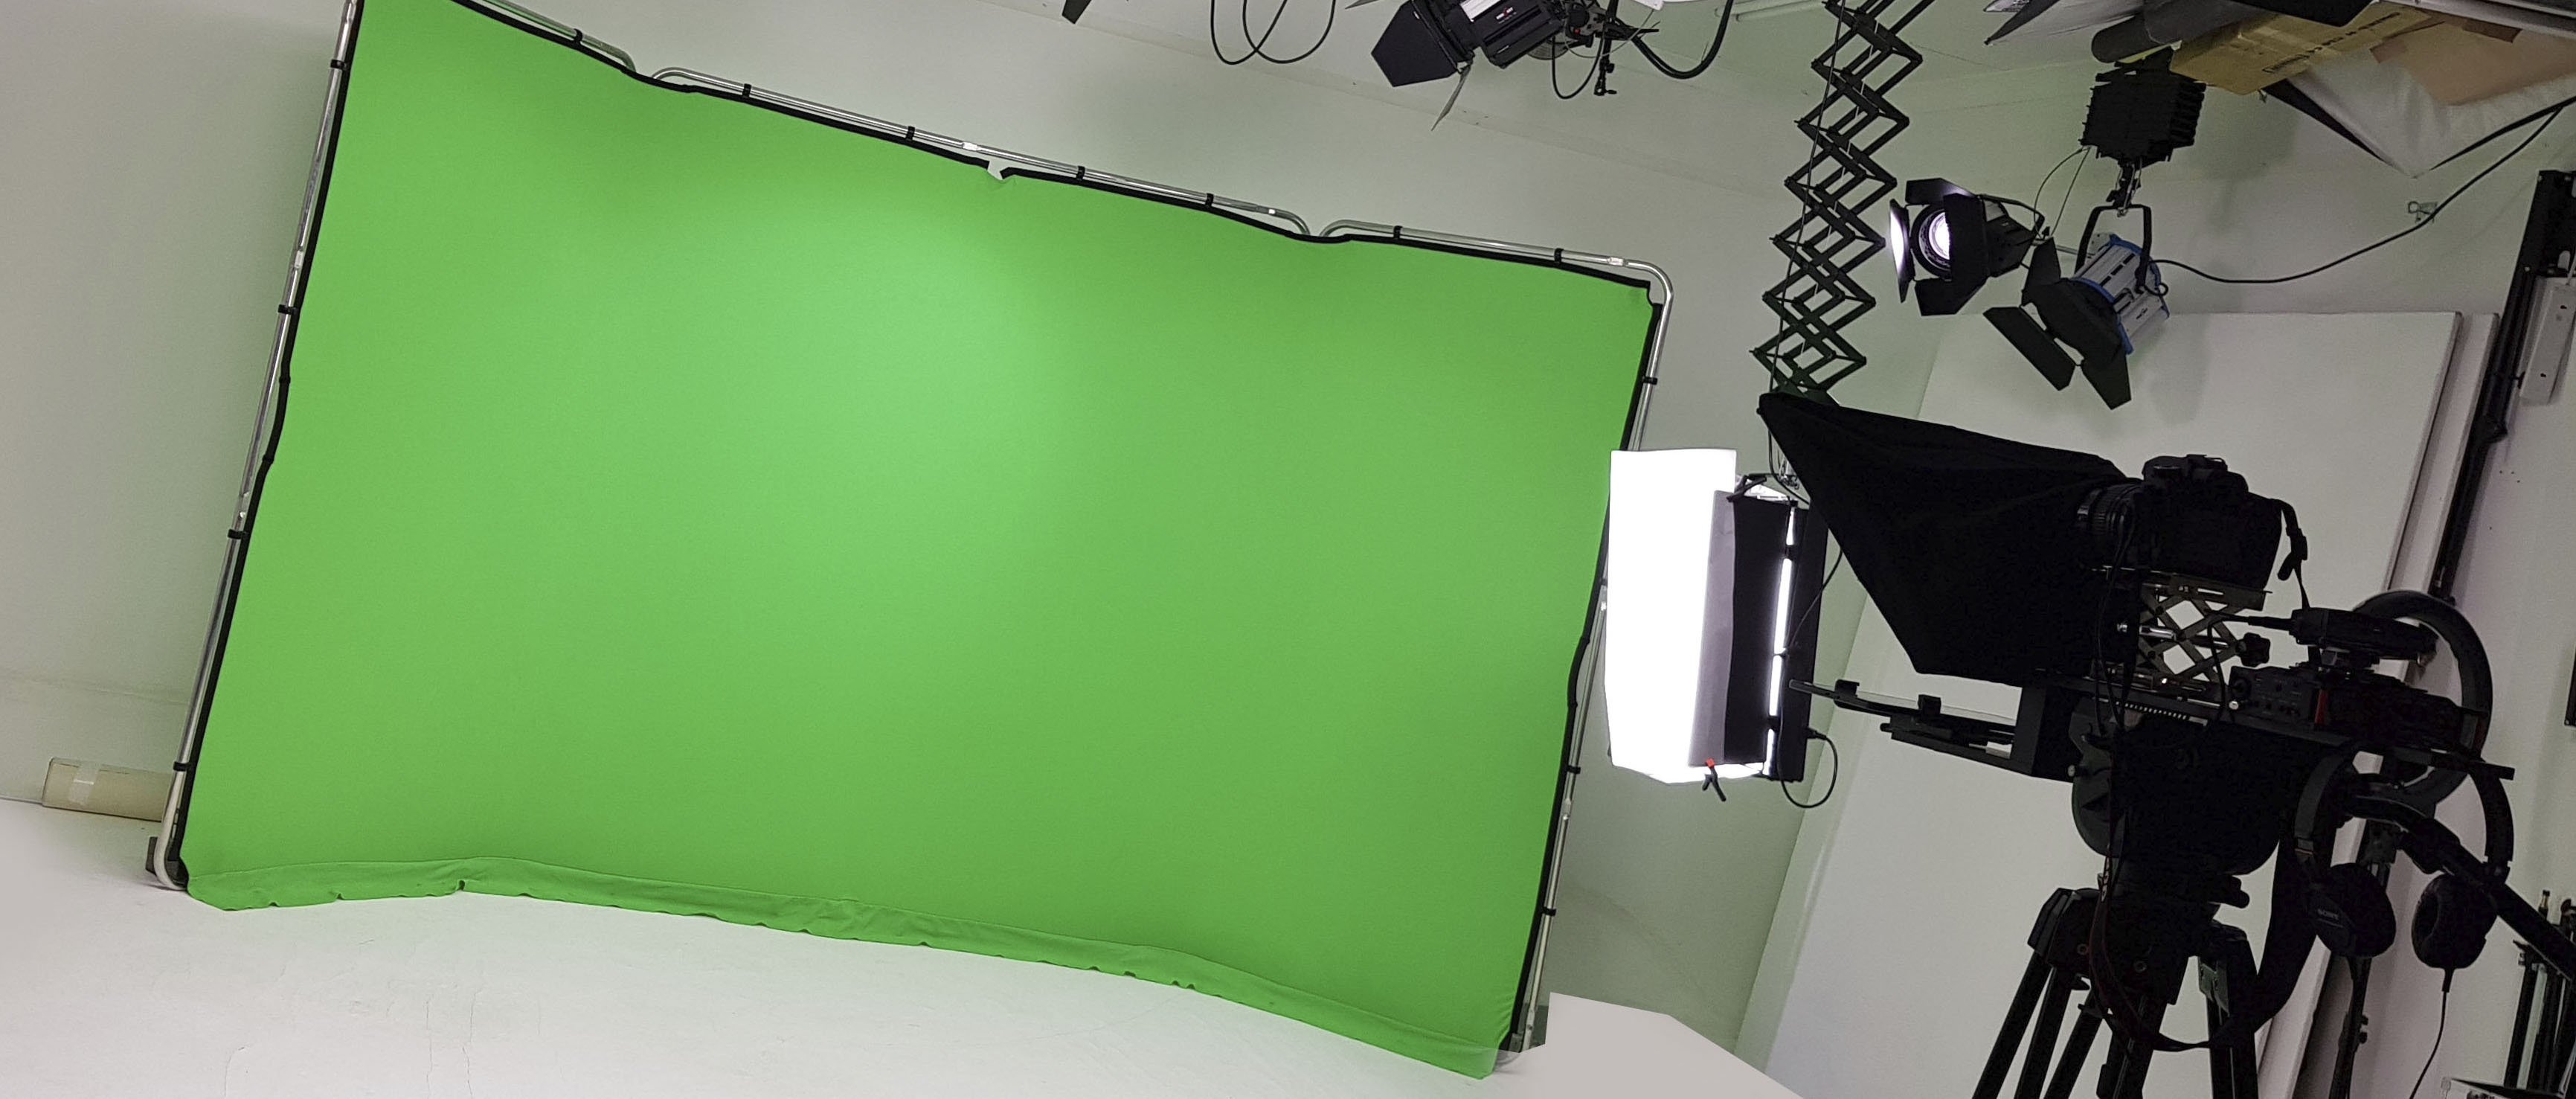 greenscreen-autocue-studio-hire-leeds